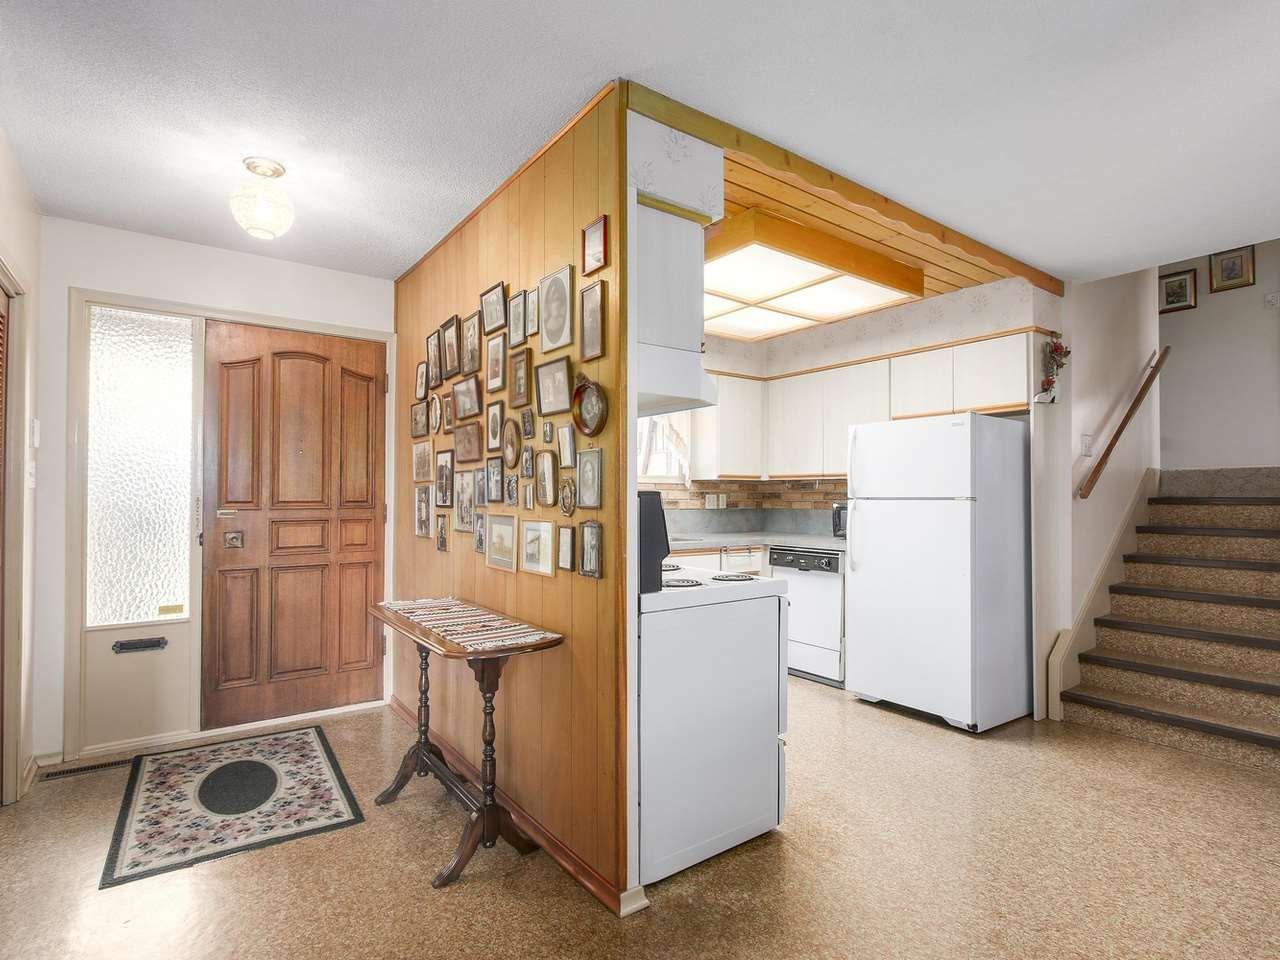 Photo 7: Photos: 1320 REGAN Avenue in Coquitlam: Central Coquitlam House for sale : MLS®# R2147096